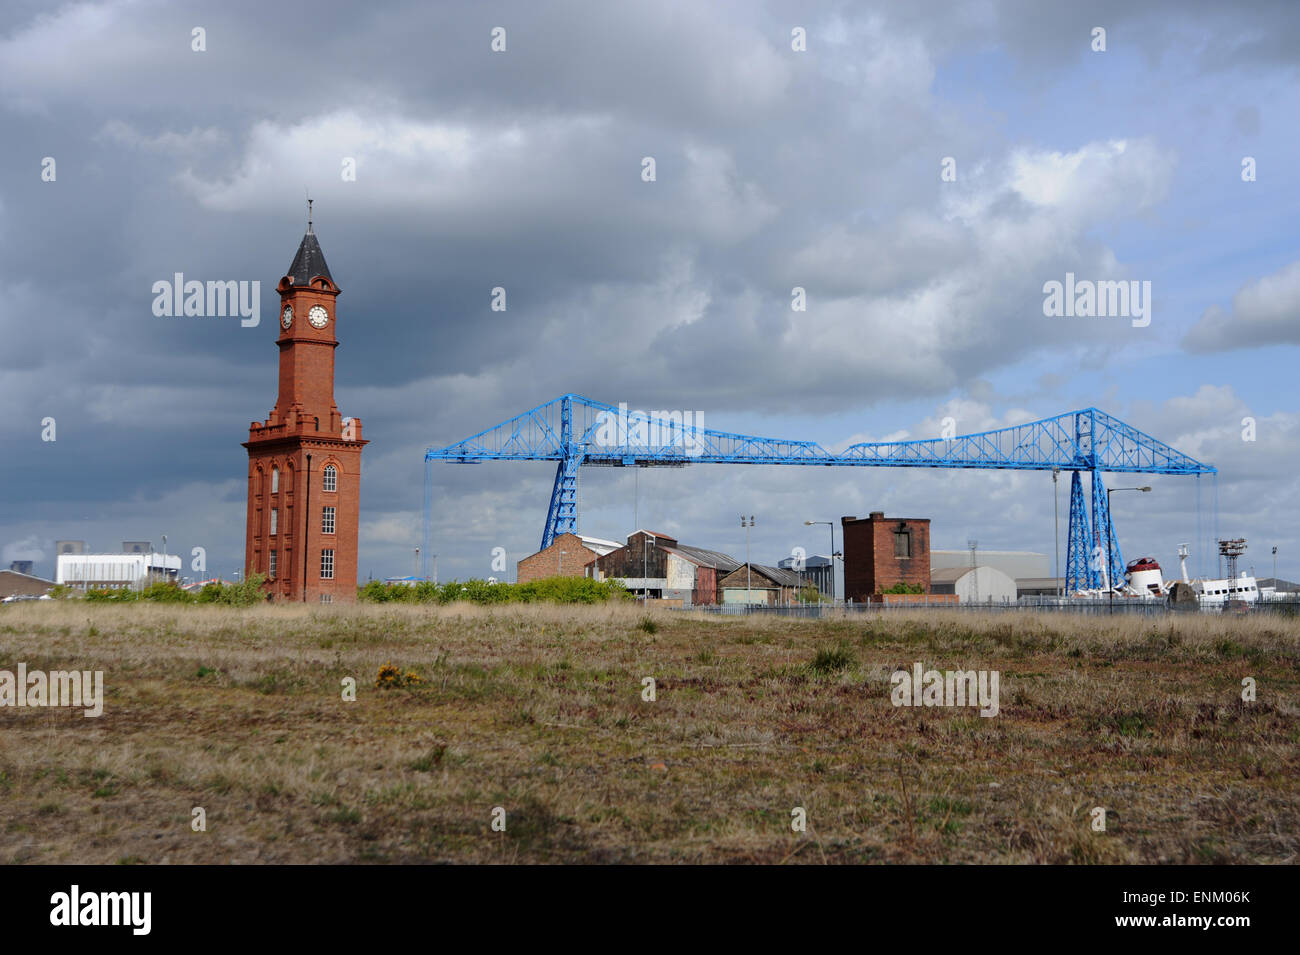 Middlesbrough Teeside UK - The Tees Transporter Bridge in North East - Stock Image